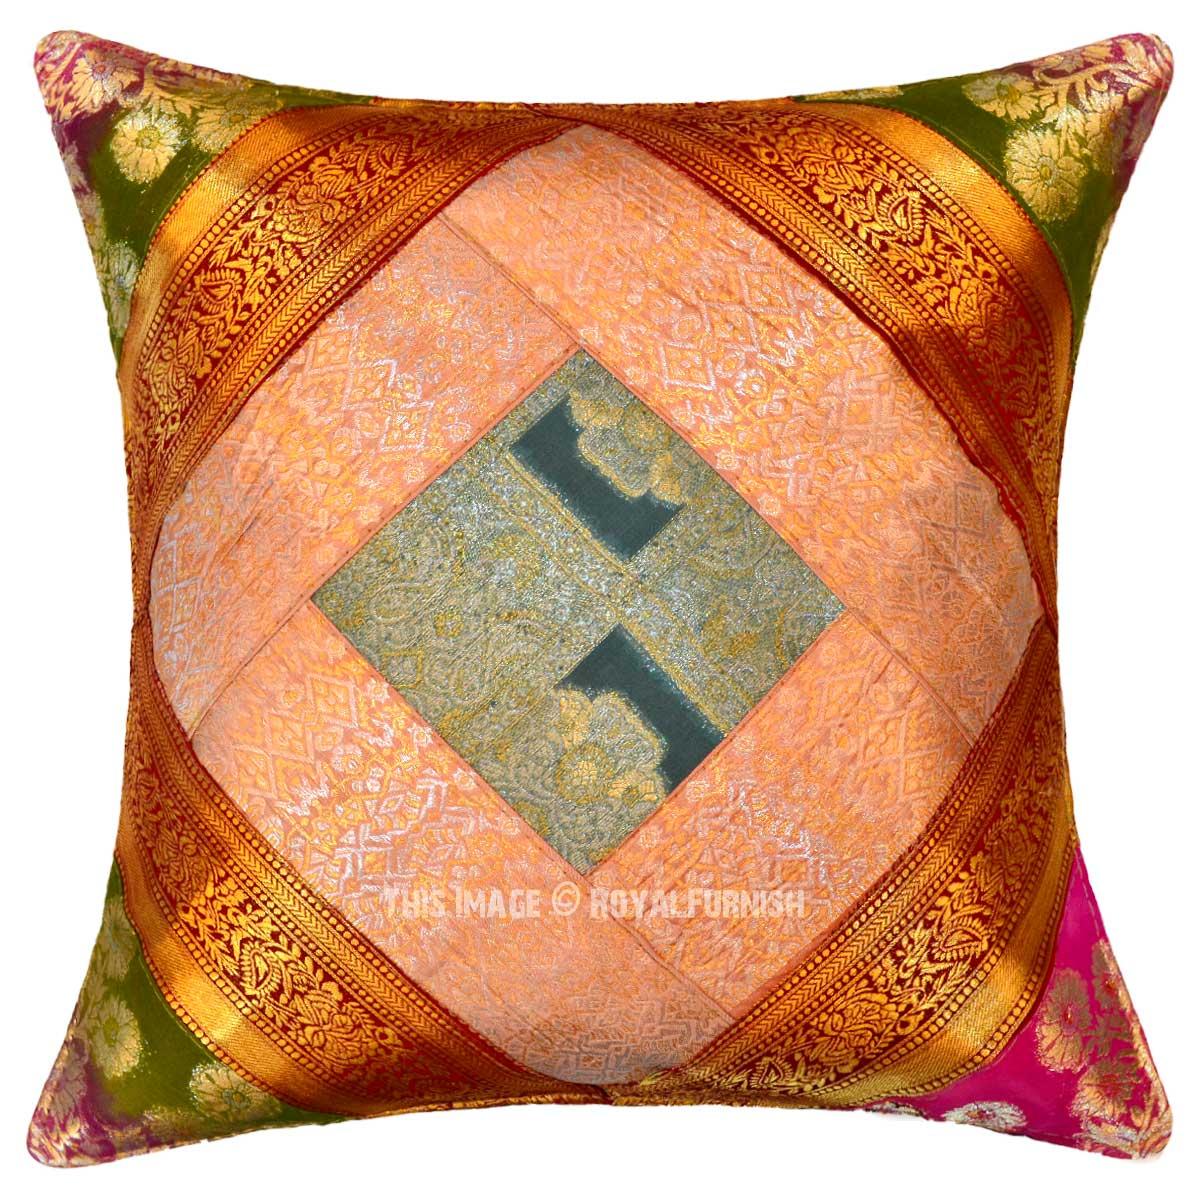 Decorative Handcrafted Unique Silk Sari Brocade Throw Pillow Cover 16X16 Inch - RoyalFurnish.com